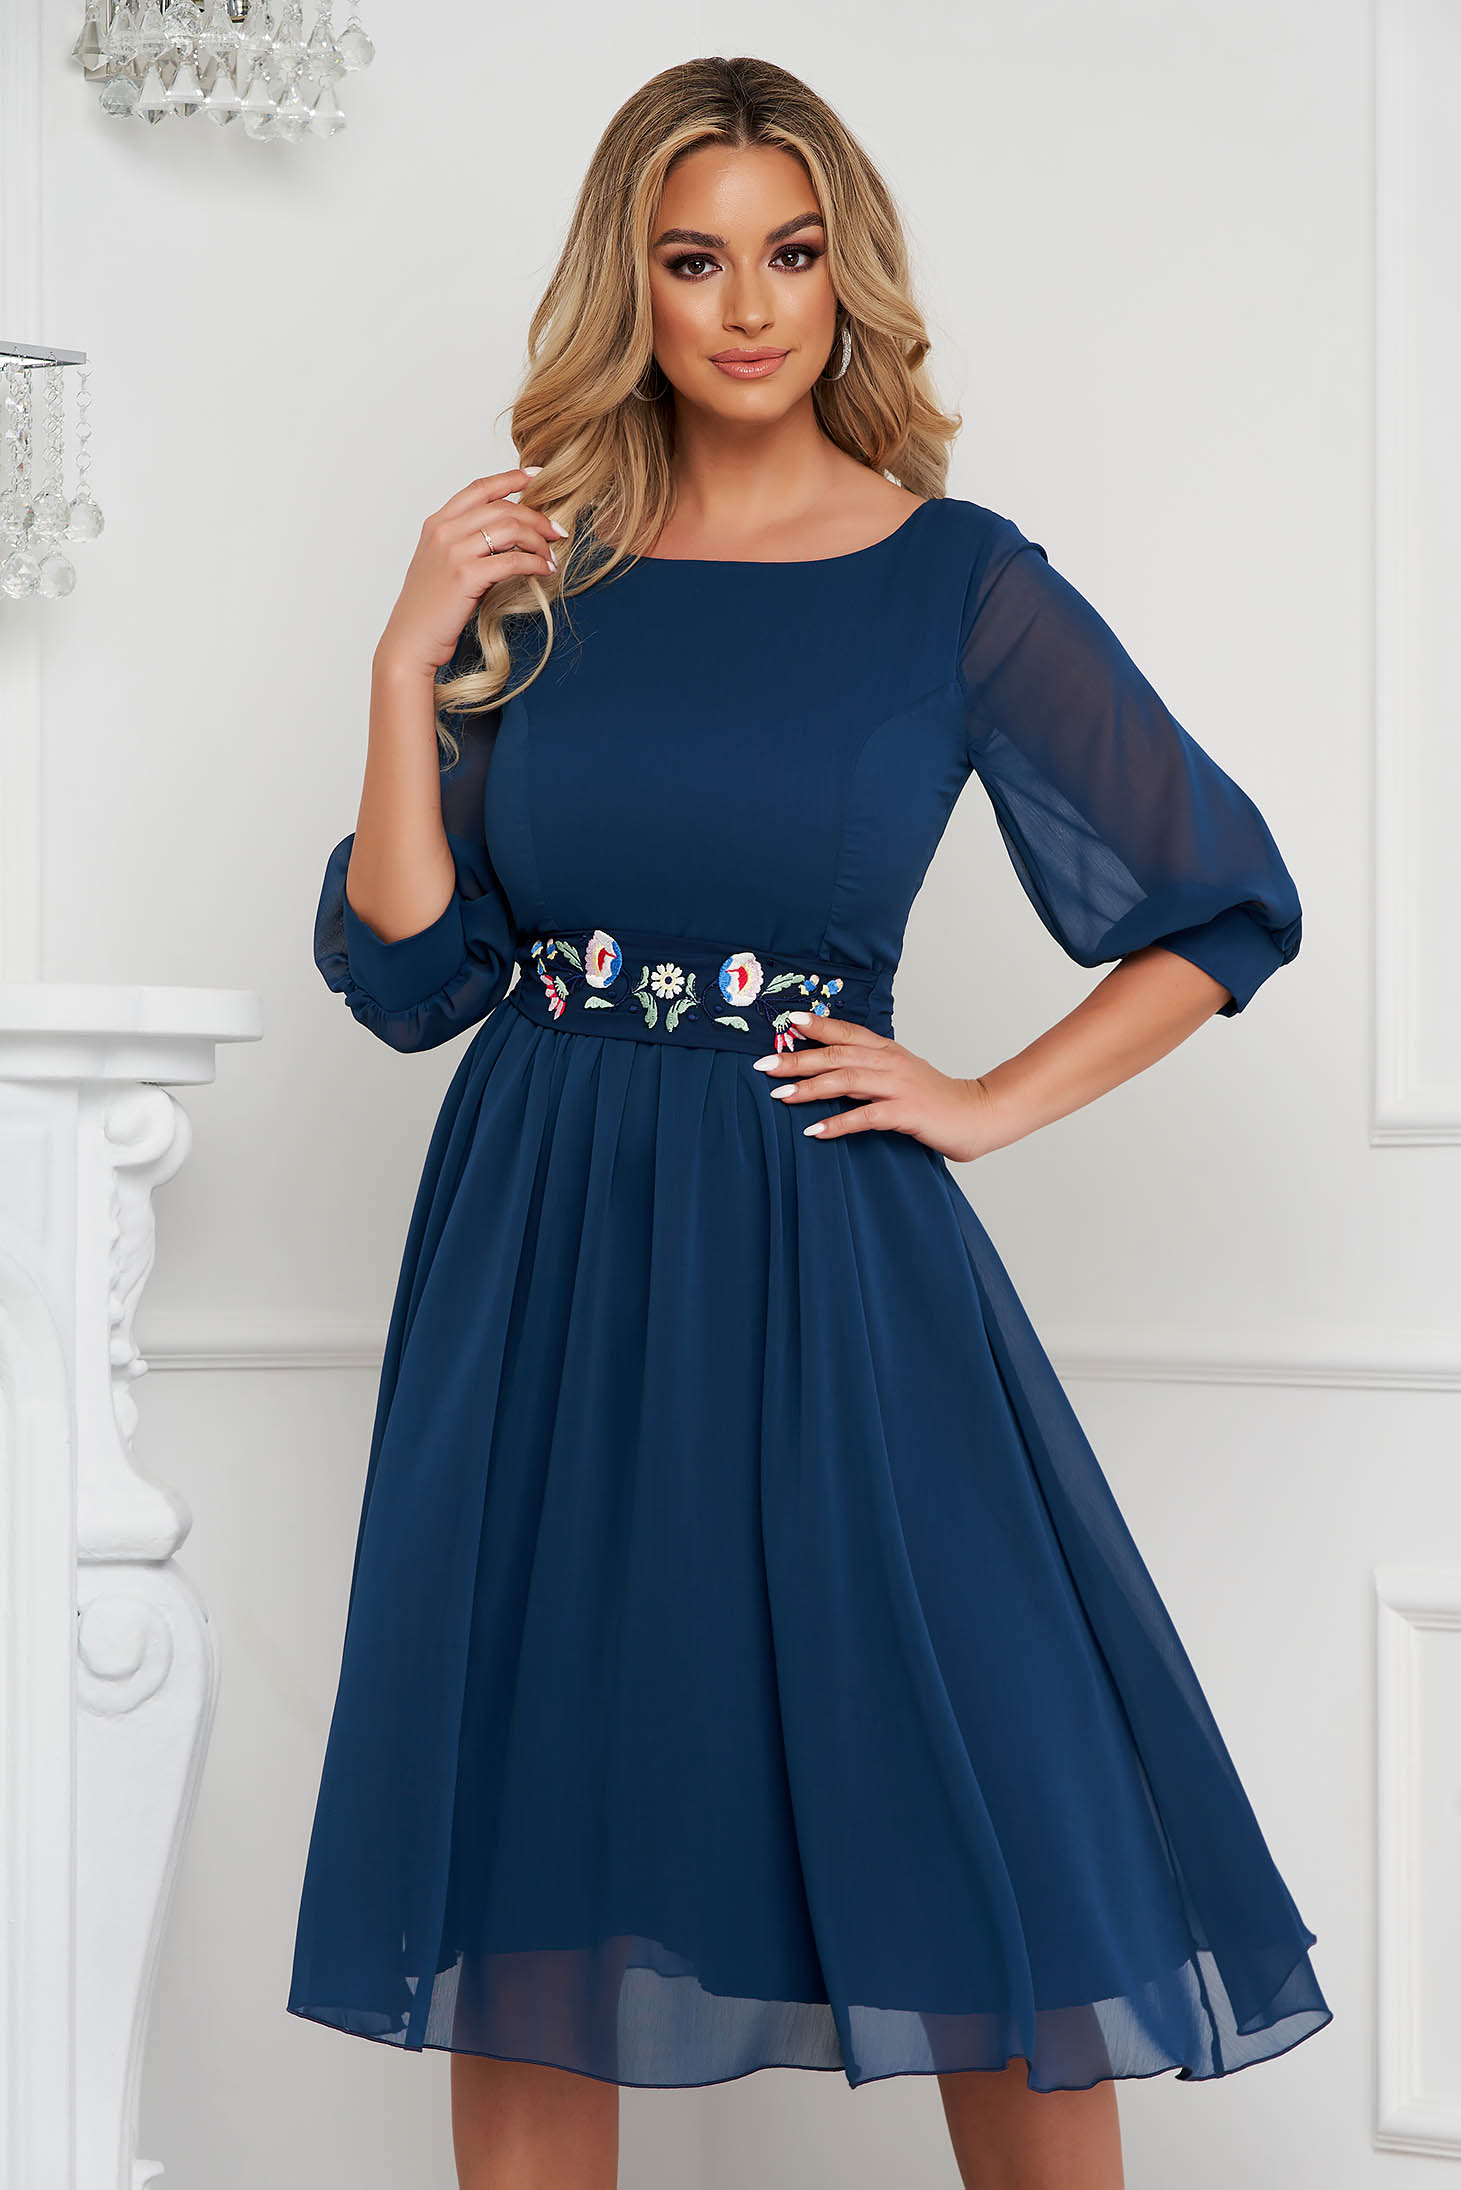 StarShinerS darkblue dress occasional midi cloche airy fabric